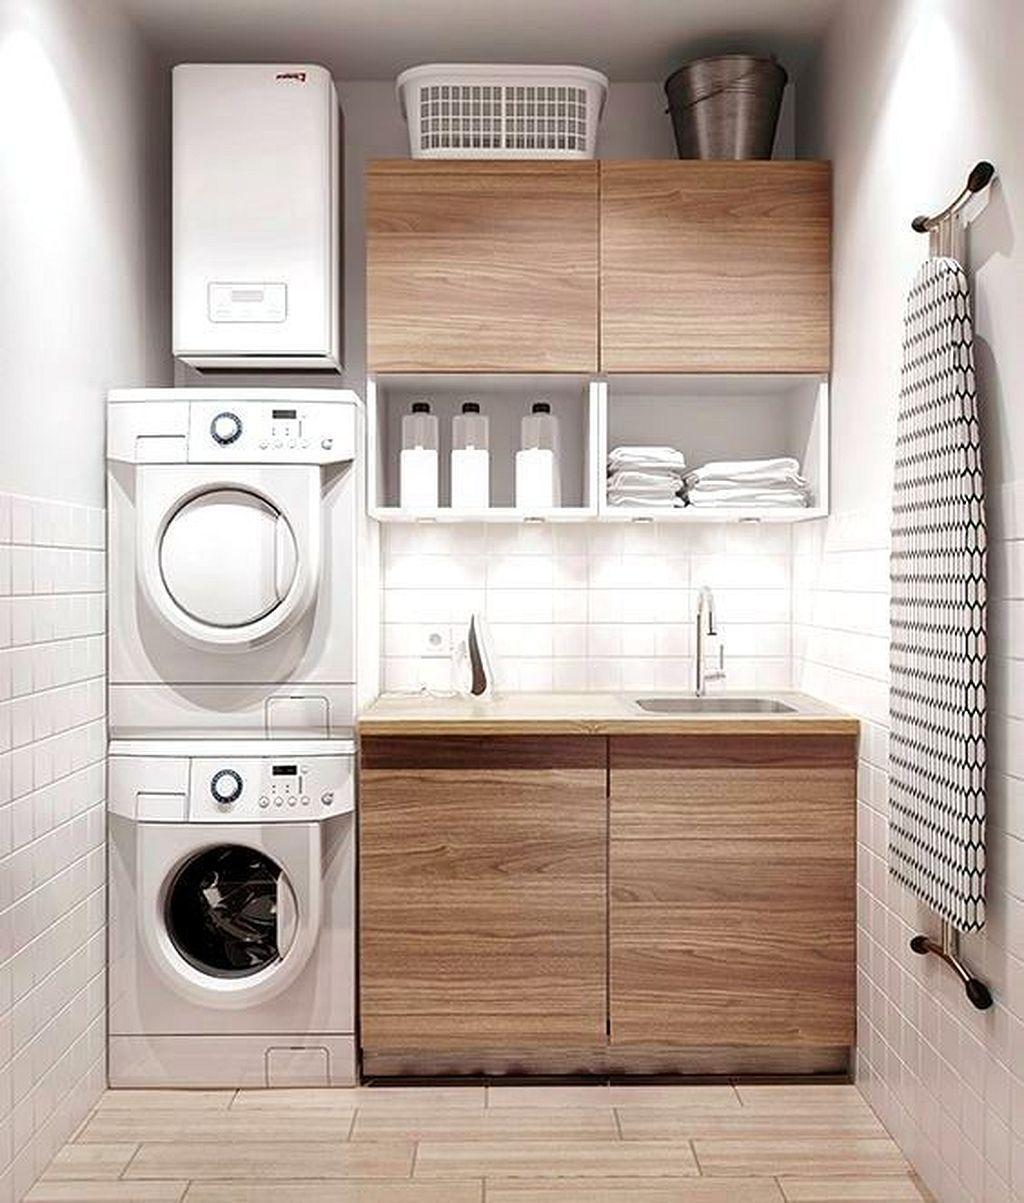 153 Modern Laundry Room Design Ideas | Modern laundry rooms, Laundry ...